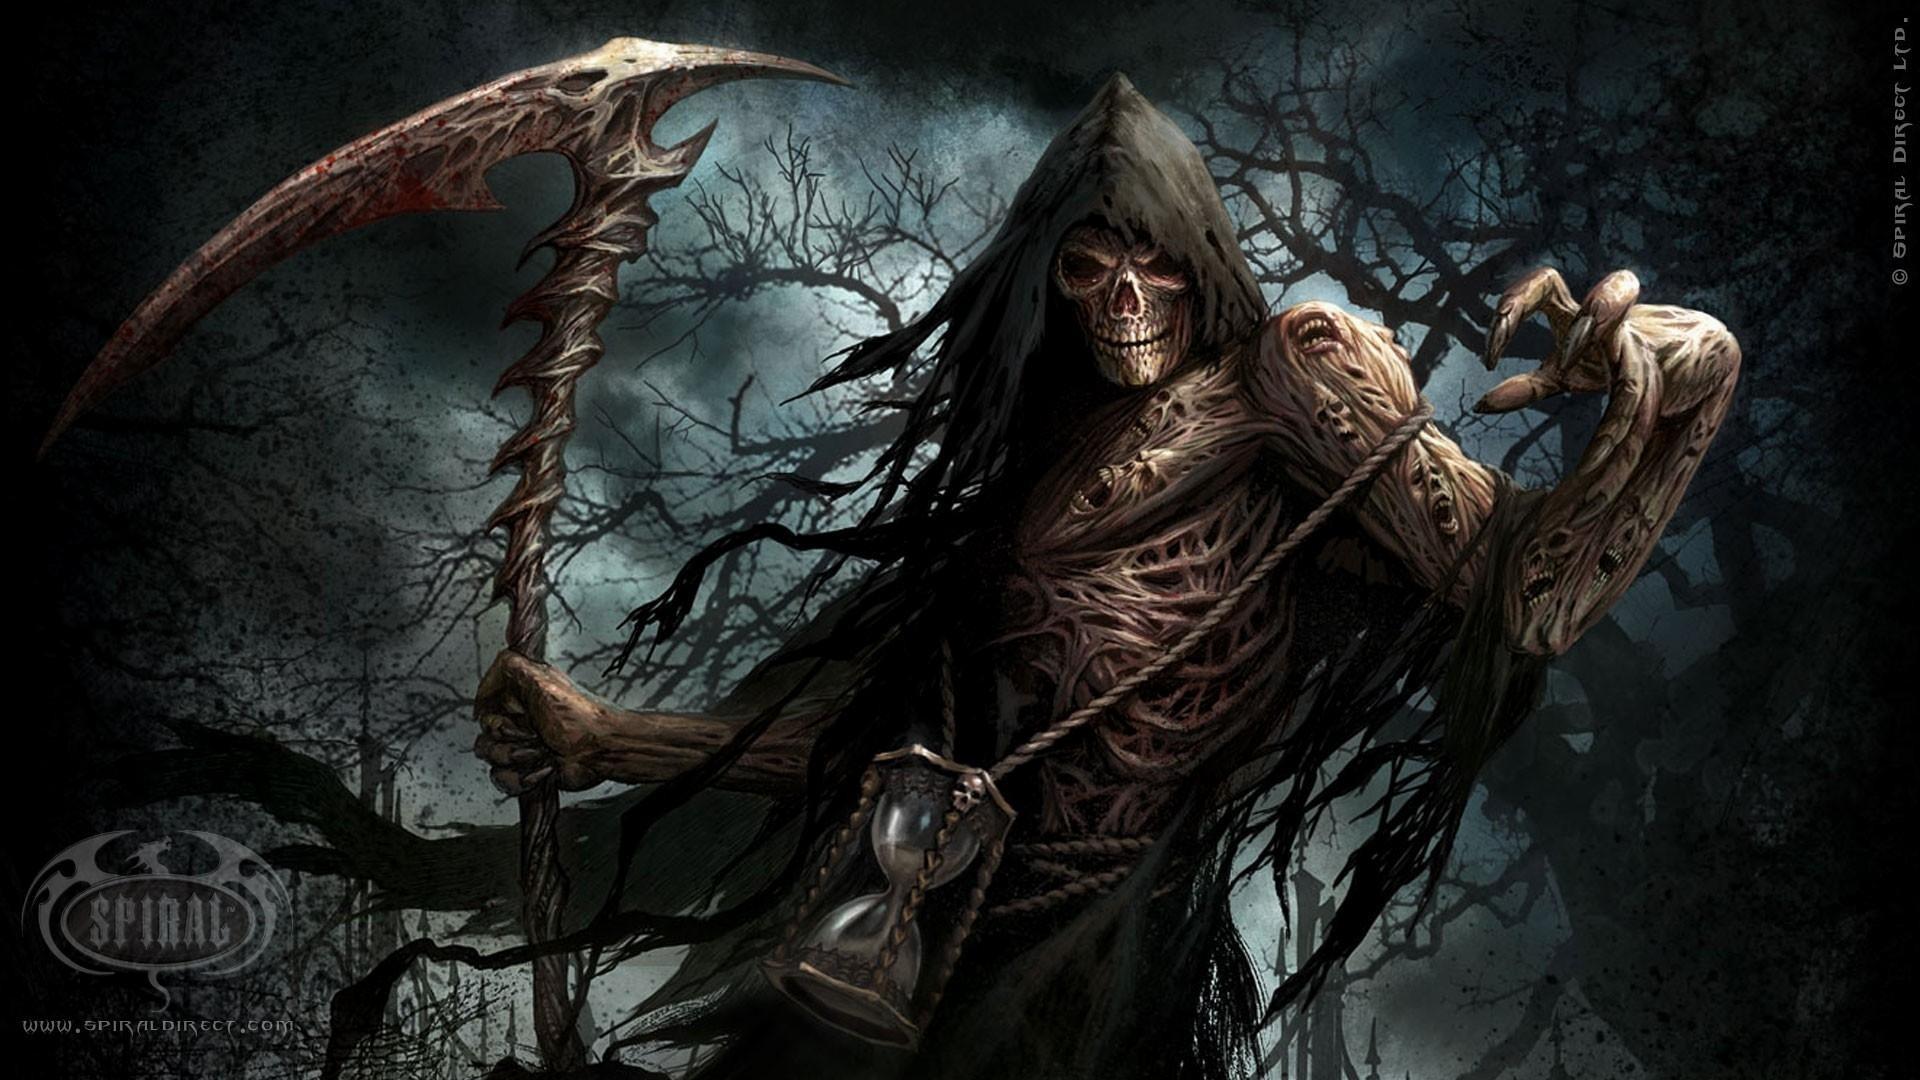 death-trees-dark-night-text-scythe-video-skeletons-